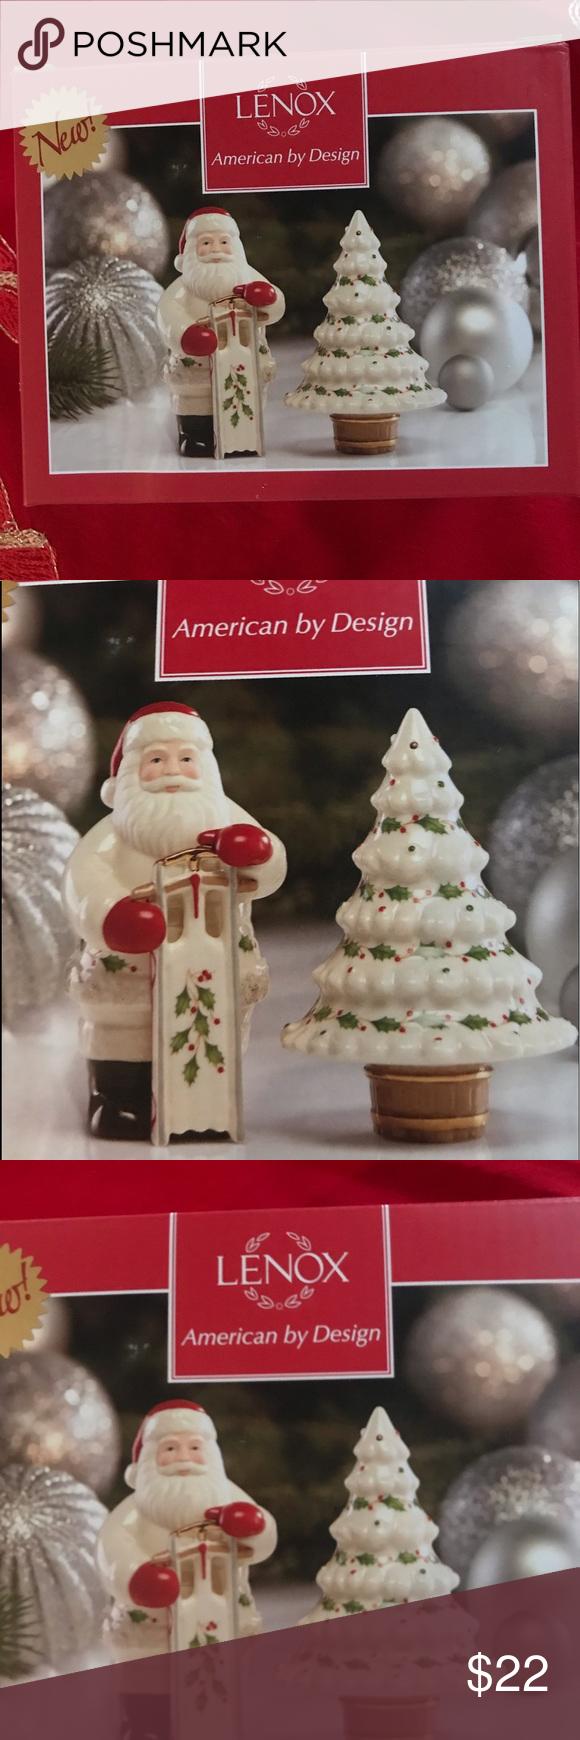 LENOX NEW in Box Santa & Tree Salt & Pepper Set Lenox Salt